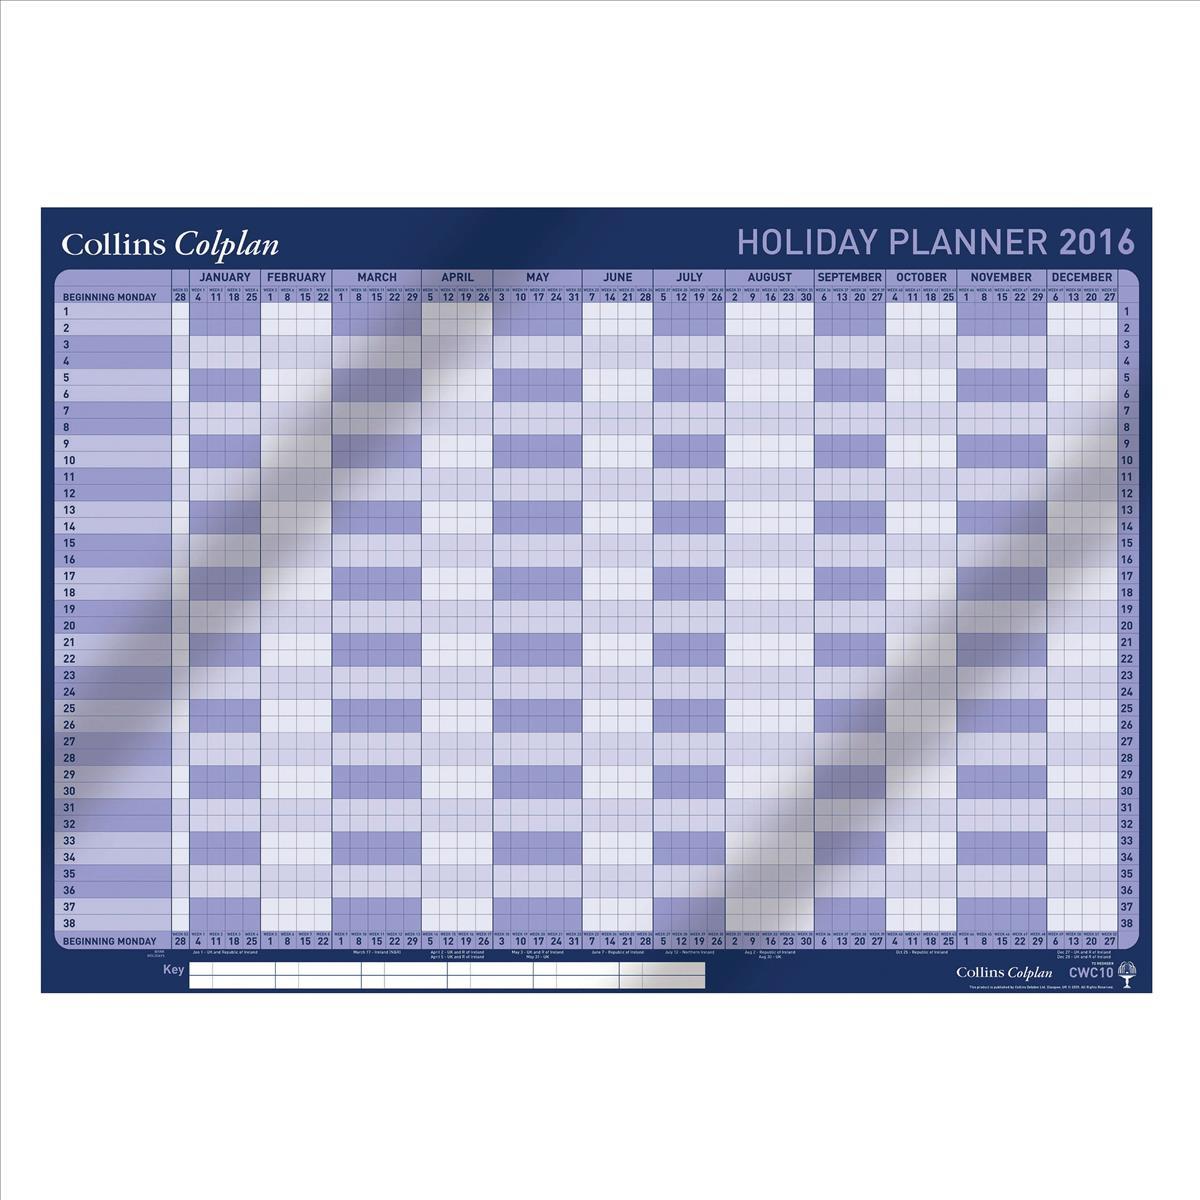 Collins 2016 Colplan HolidayPlnnr